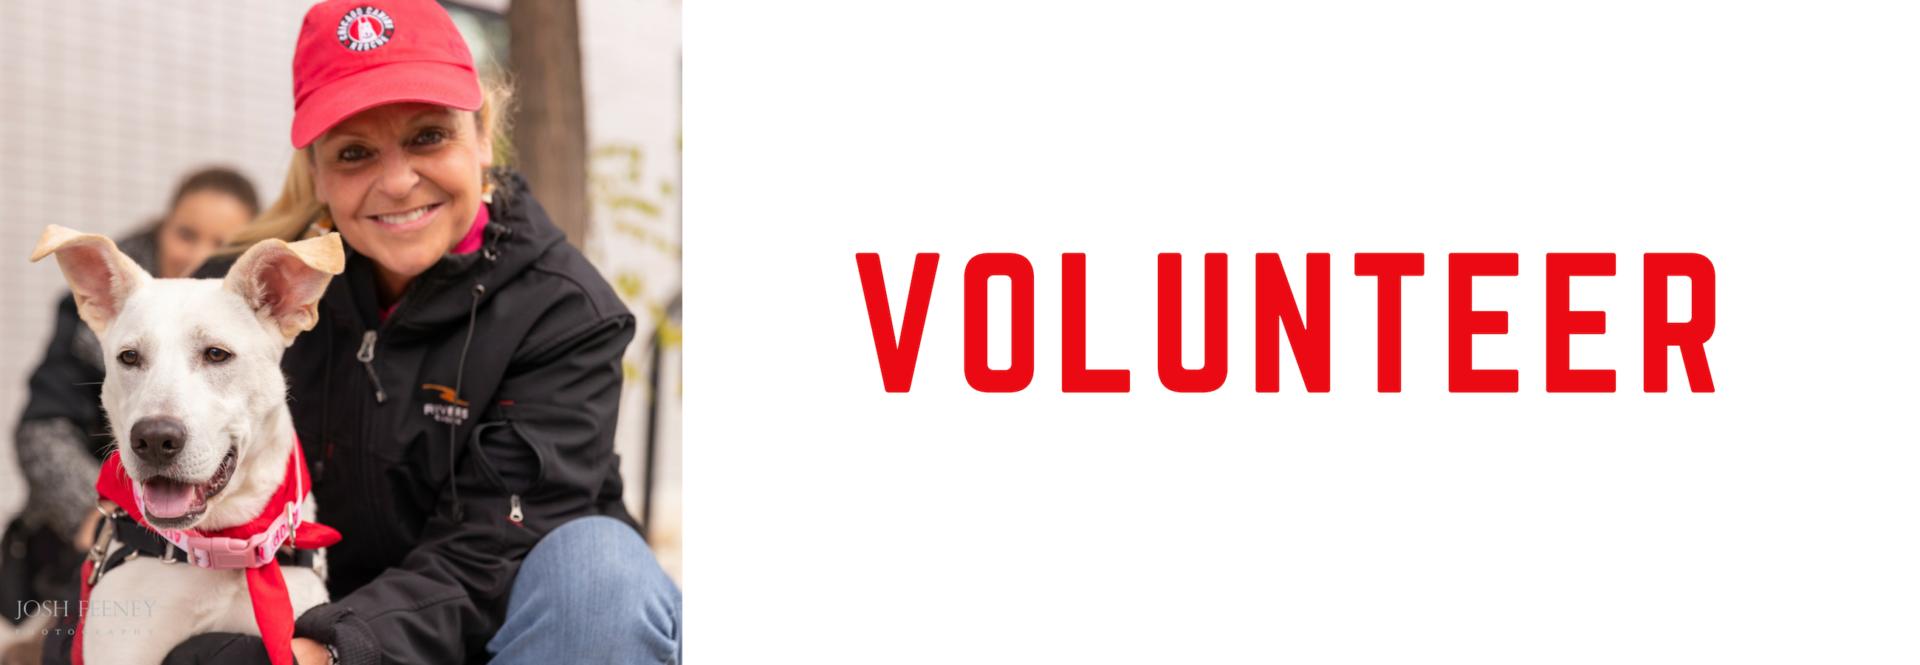 volunteerslider2